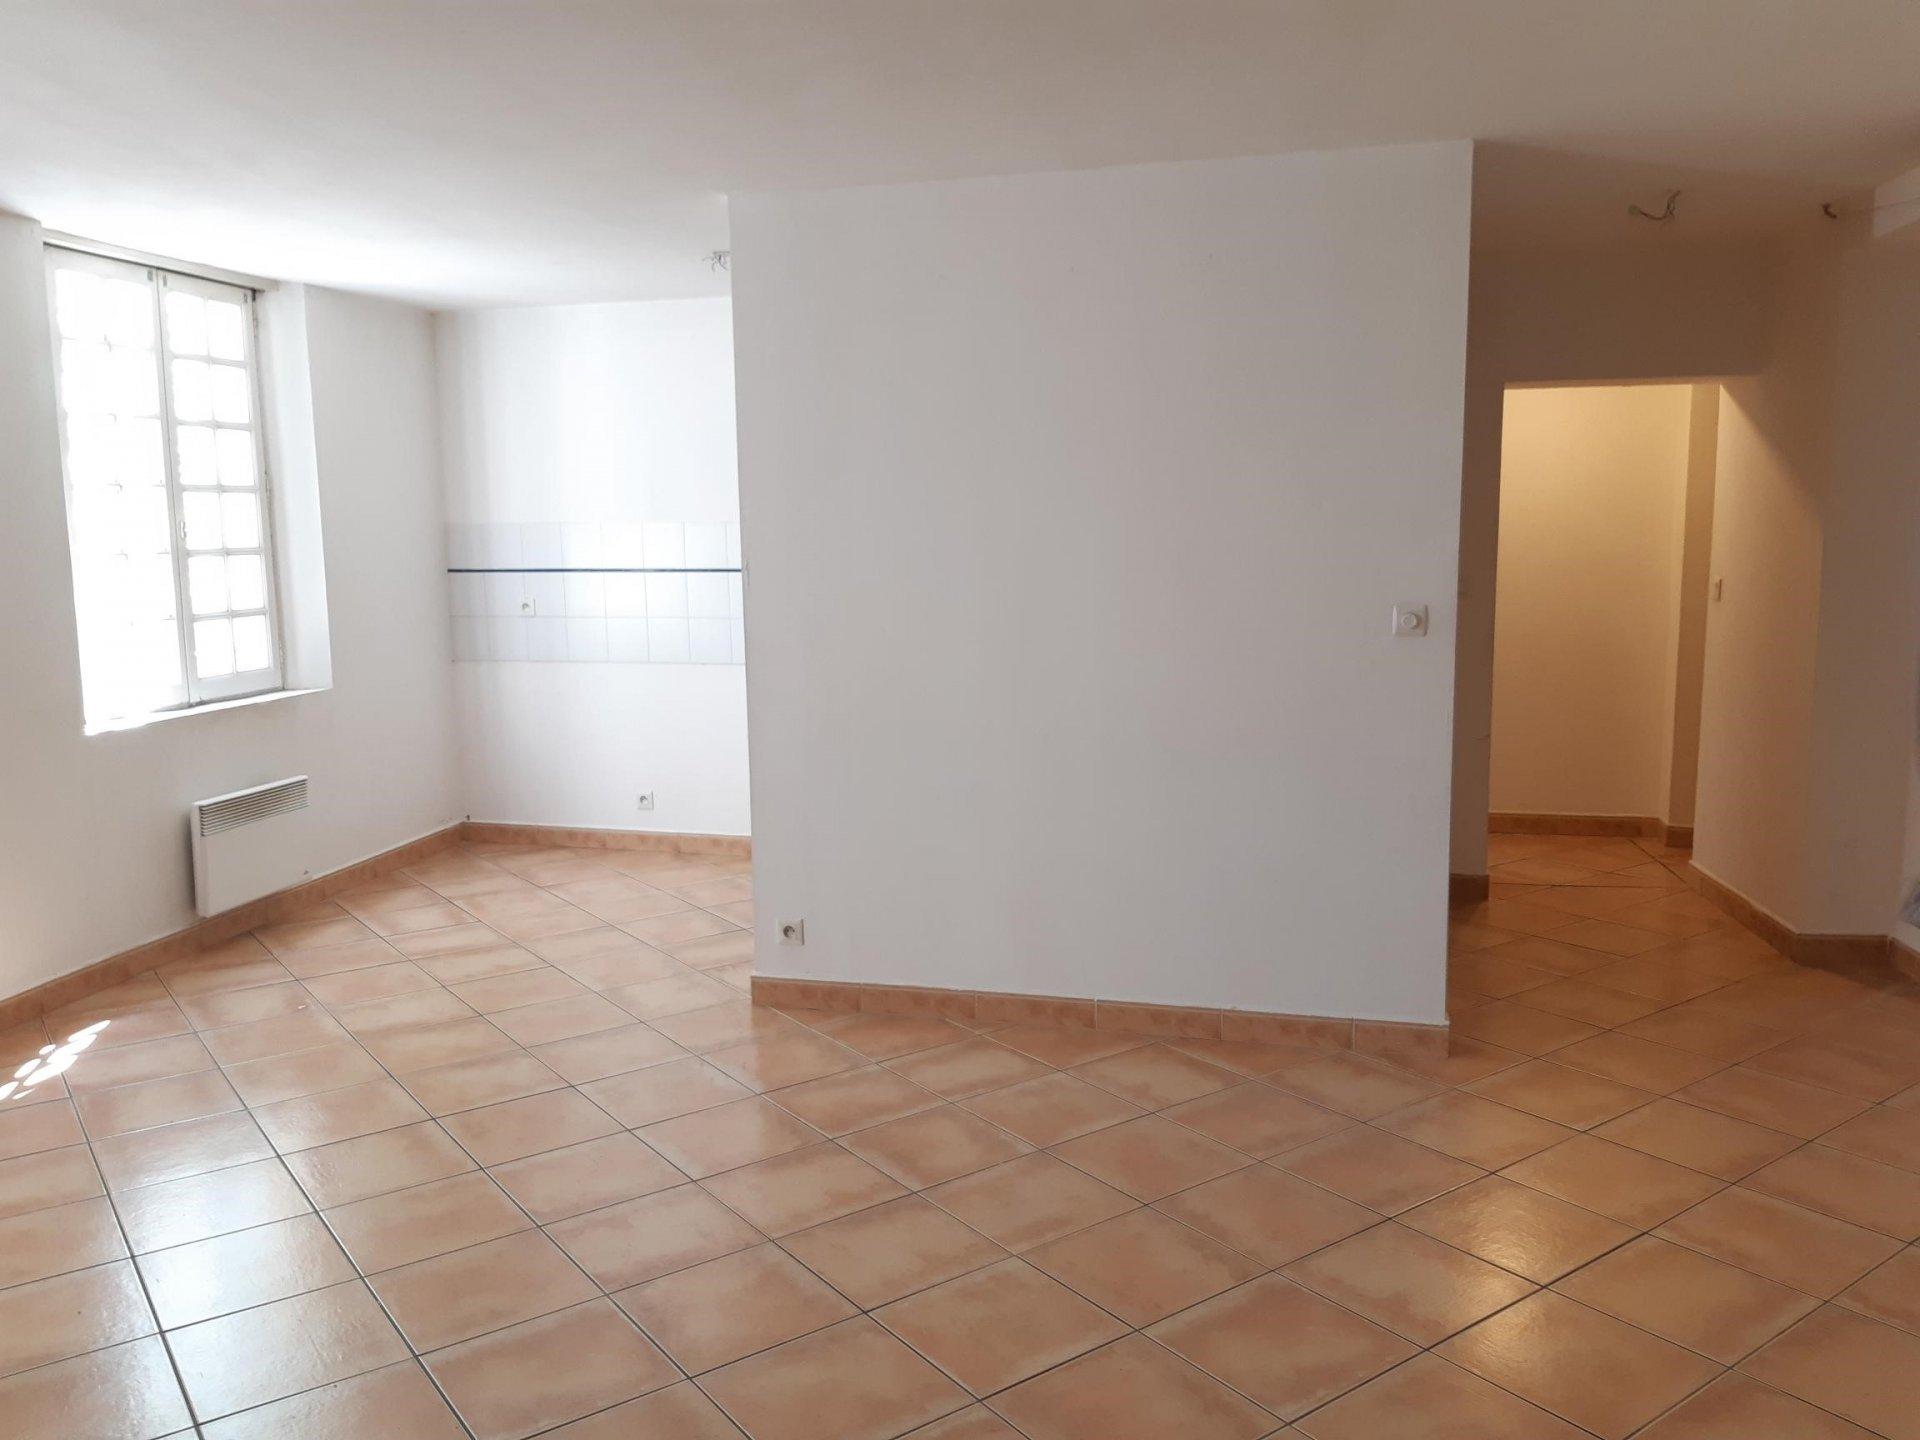 Location Appartement TARASCON surface habitable de 47 m²